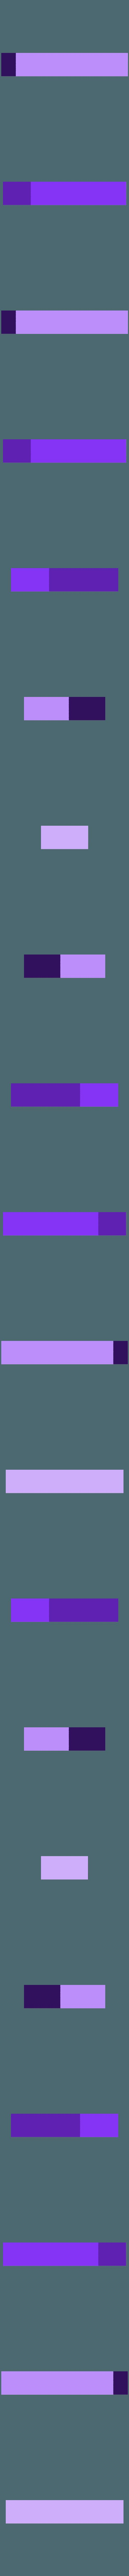 selector_v41_selector_v41_Component13_1_Body1_Component13.stl Télécharger fichier STL gratuit Plasma Cutter plotter CNC • Modèle à imprimer en 3D, TinkersProjects